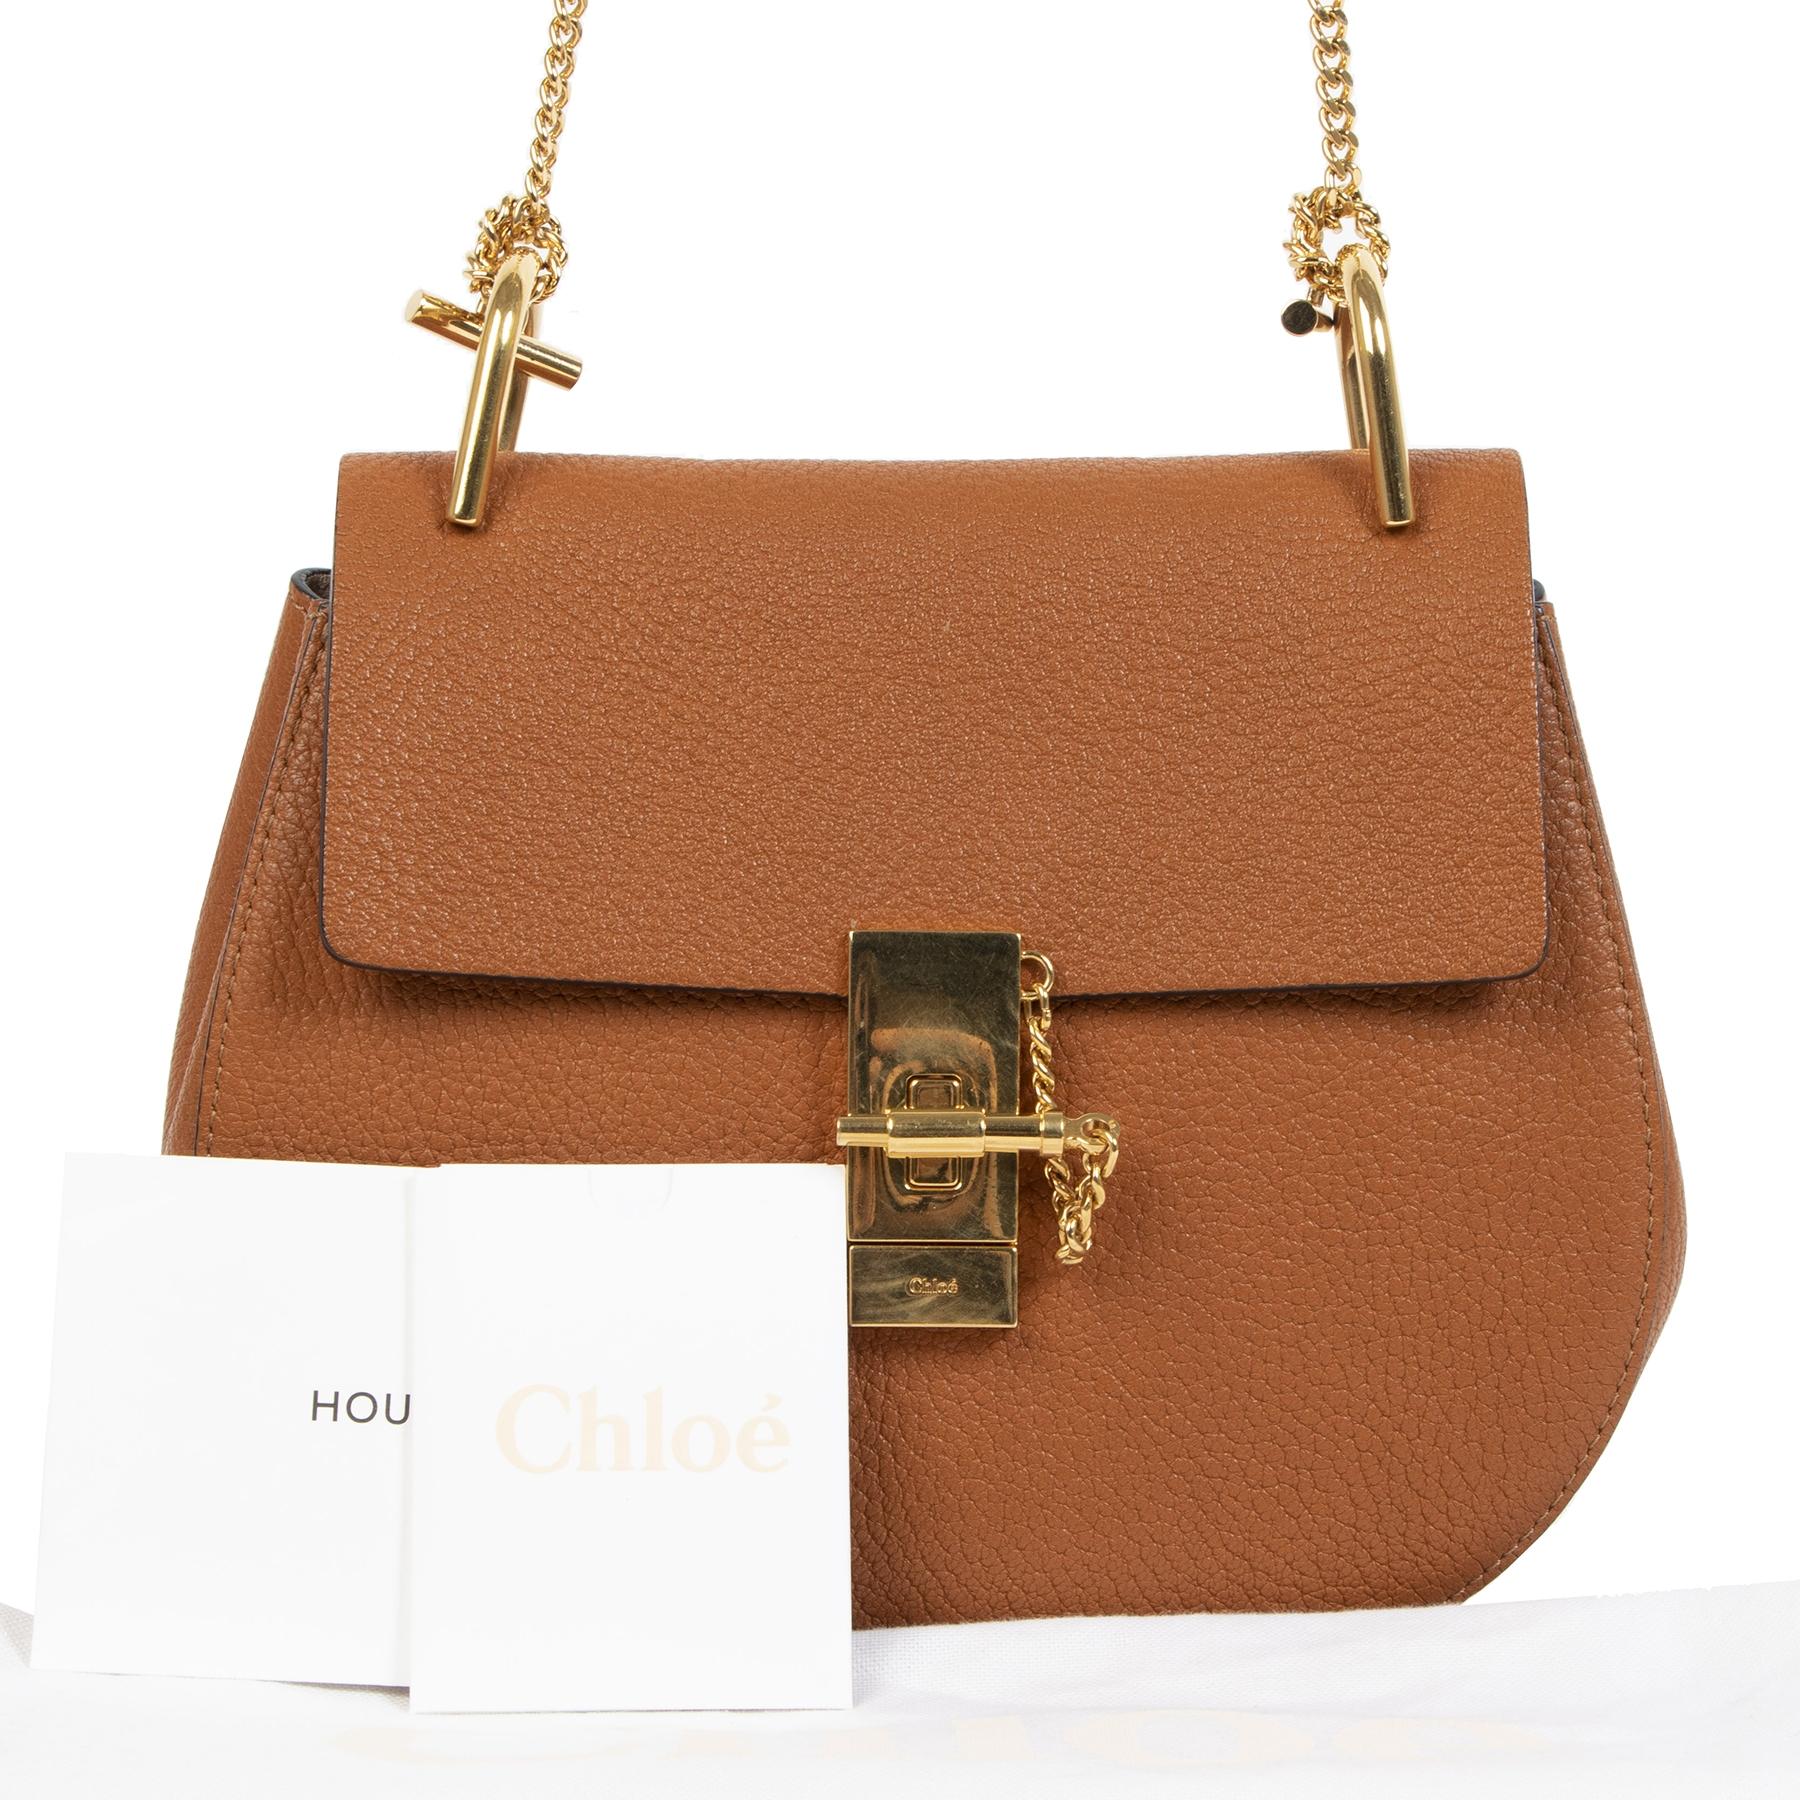 Chloé Tan Grained Calfskin Medium Drew Bag